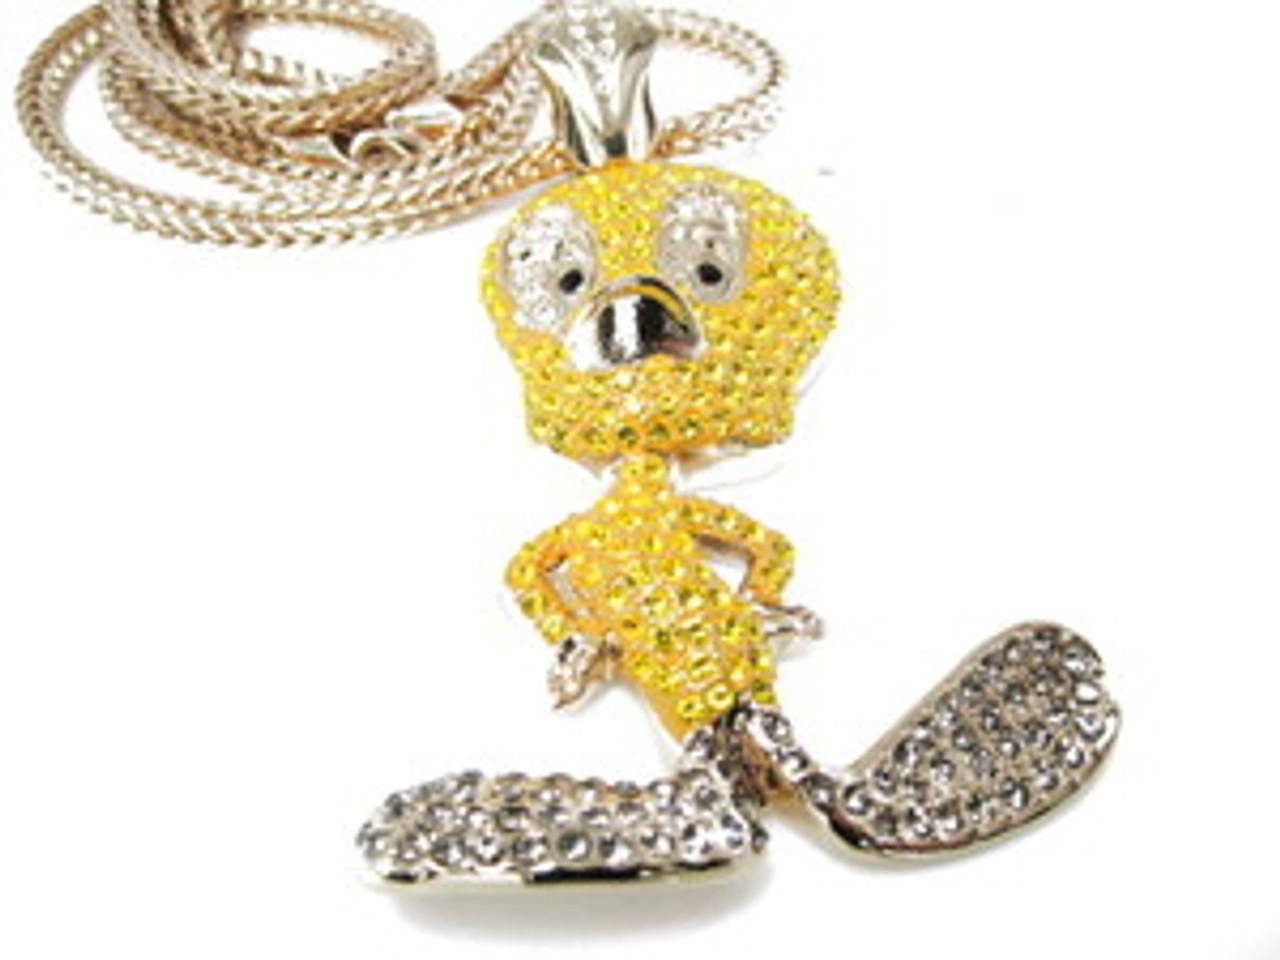 1 yellow tweety custom diamond cz wfree 36 gold franco chain 1 yellow tweety custom diamond cz wfree 36 gold franco chain aloadofball Gallery